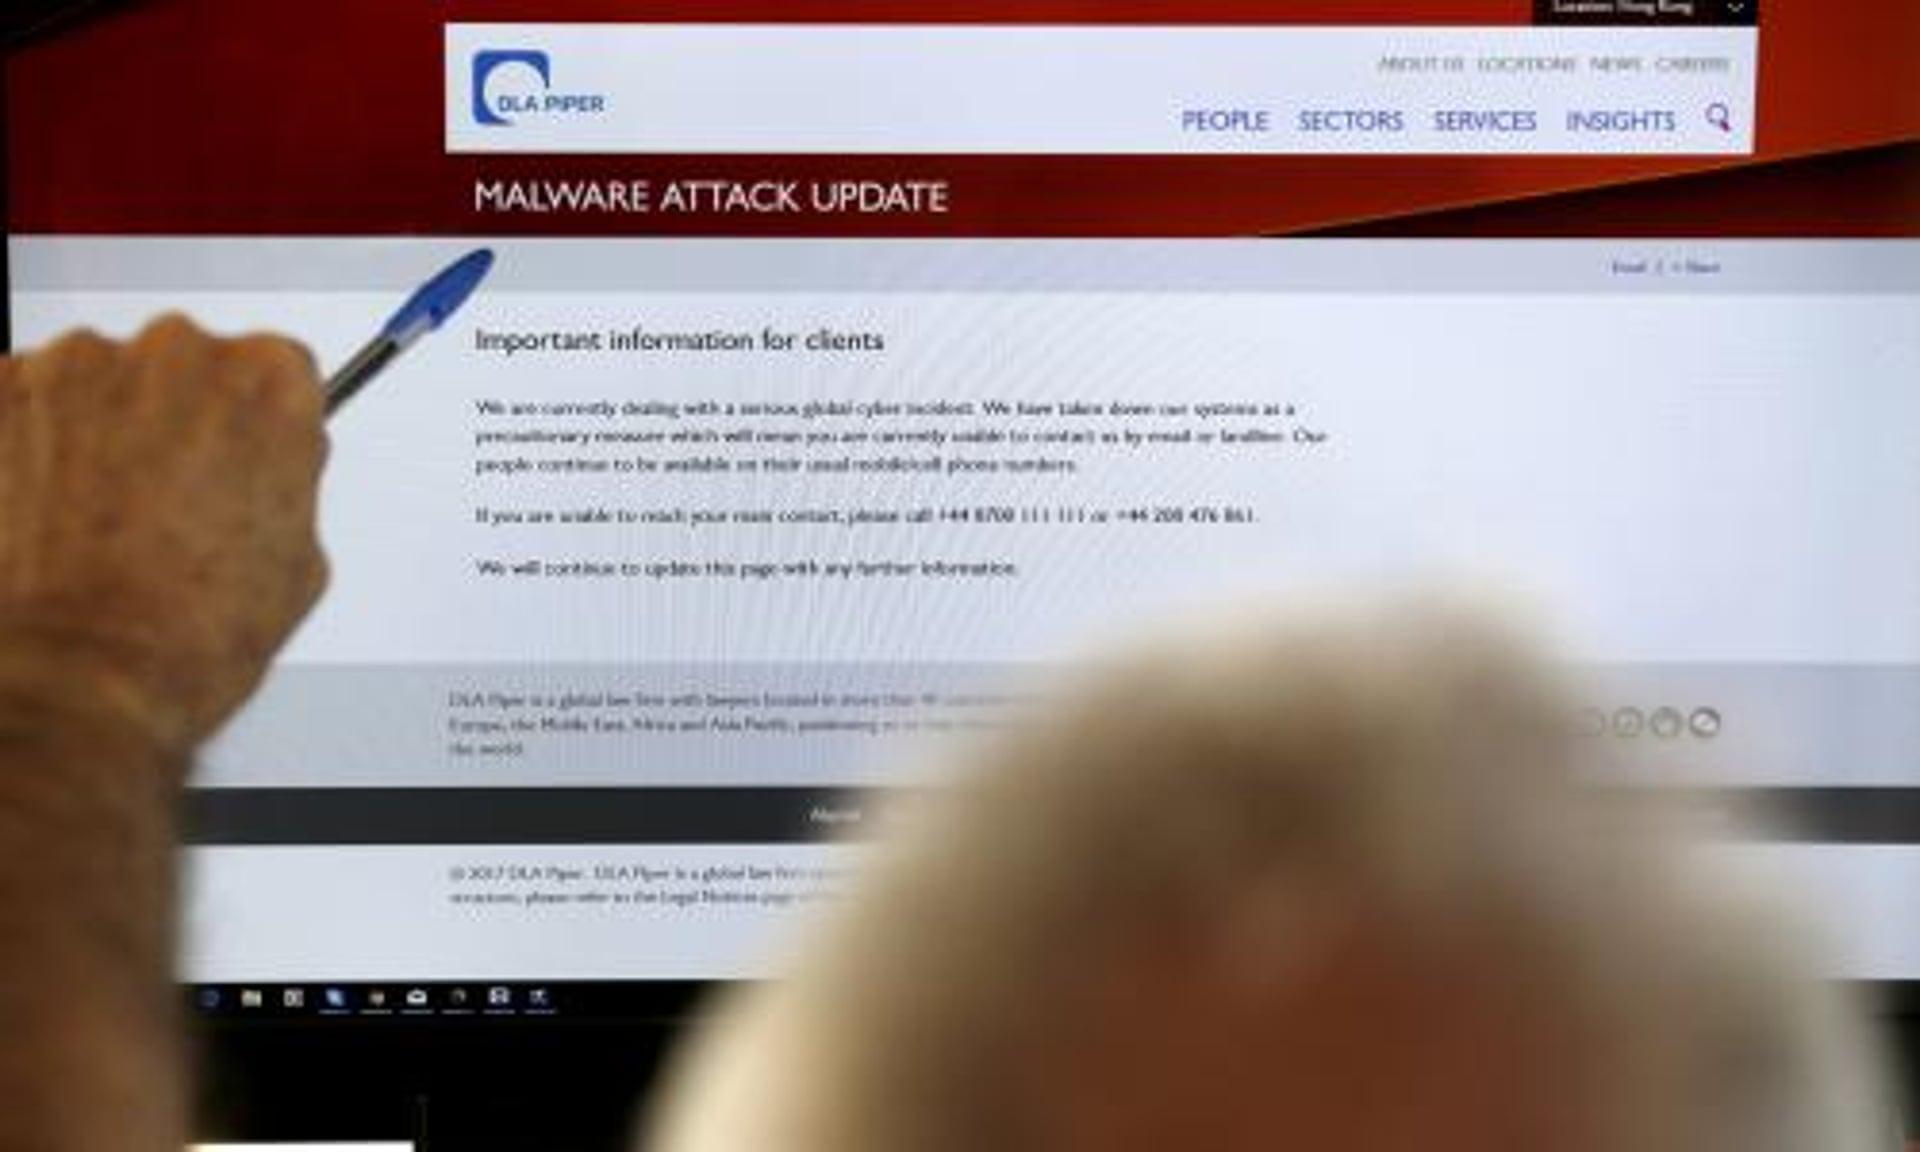 NotPetya' malware s could warrant retaliation, says Nato ... on